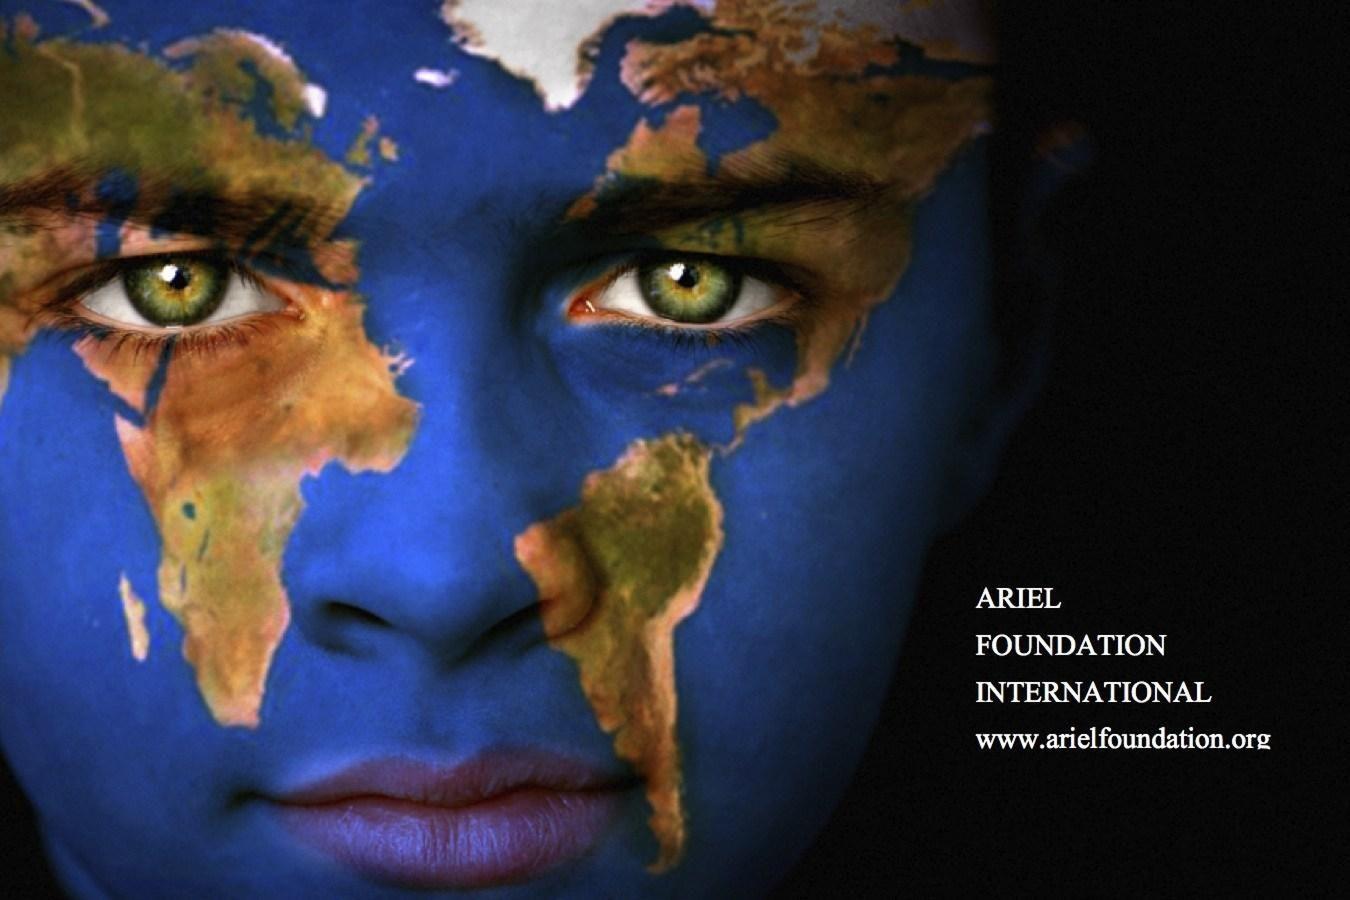 Spotlight on NGO: Ariel Foundation International